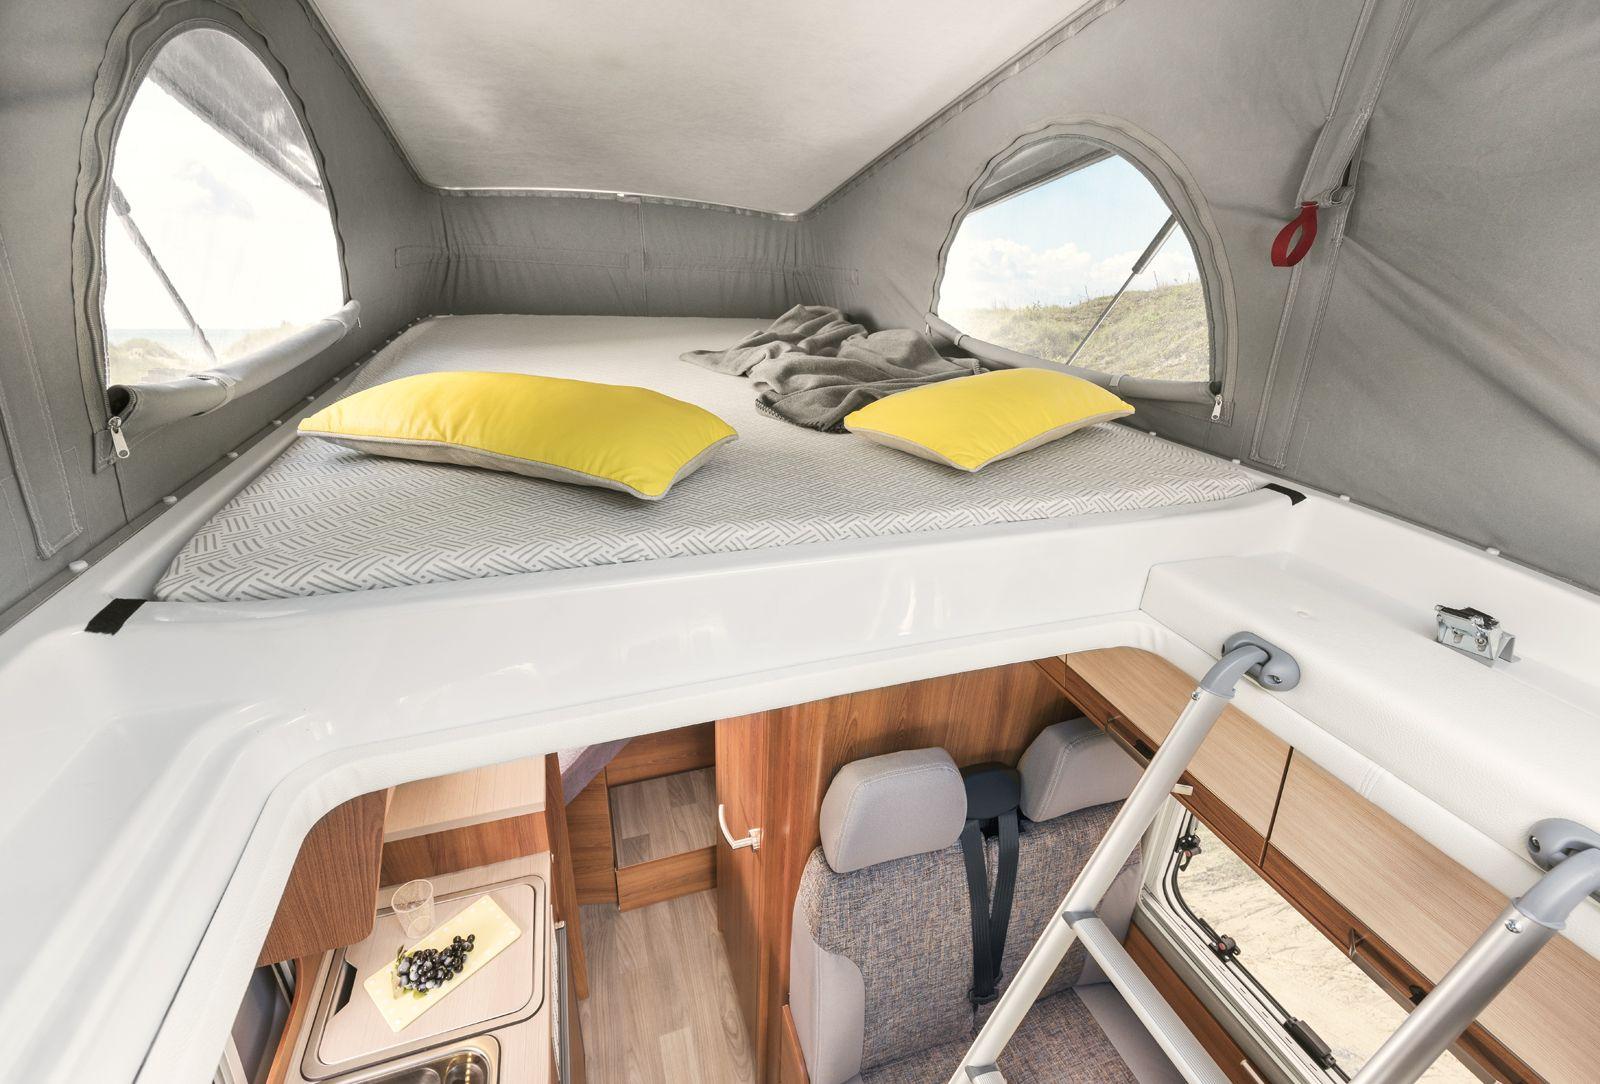 Wohnmobil Kastenwagen 5 Meter